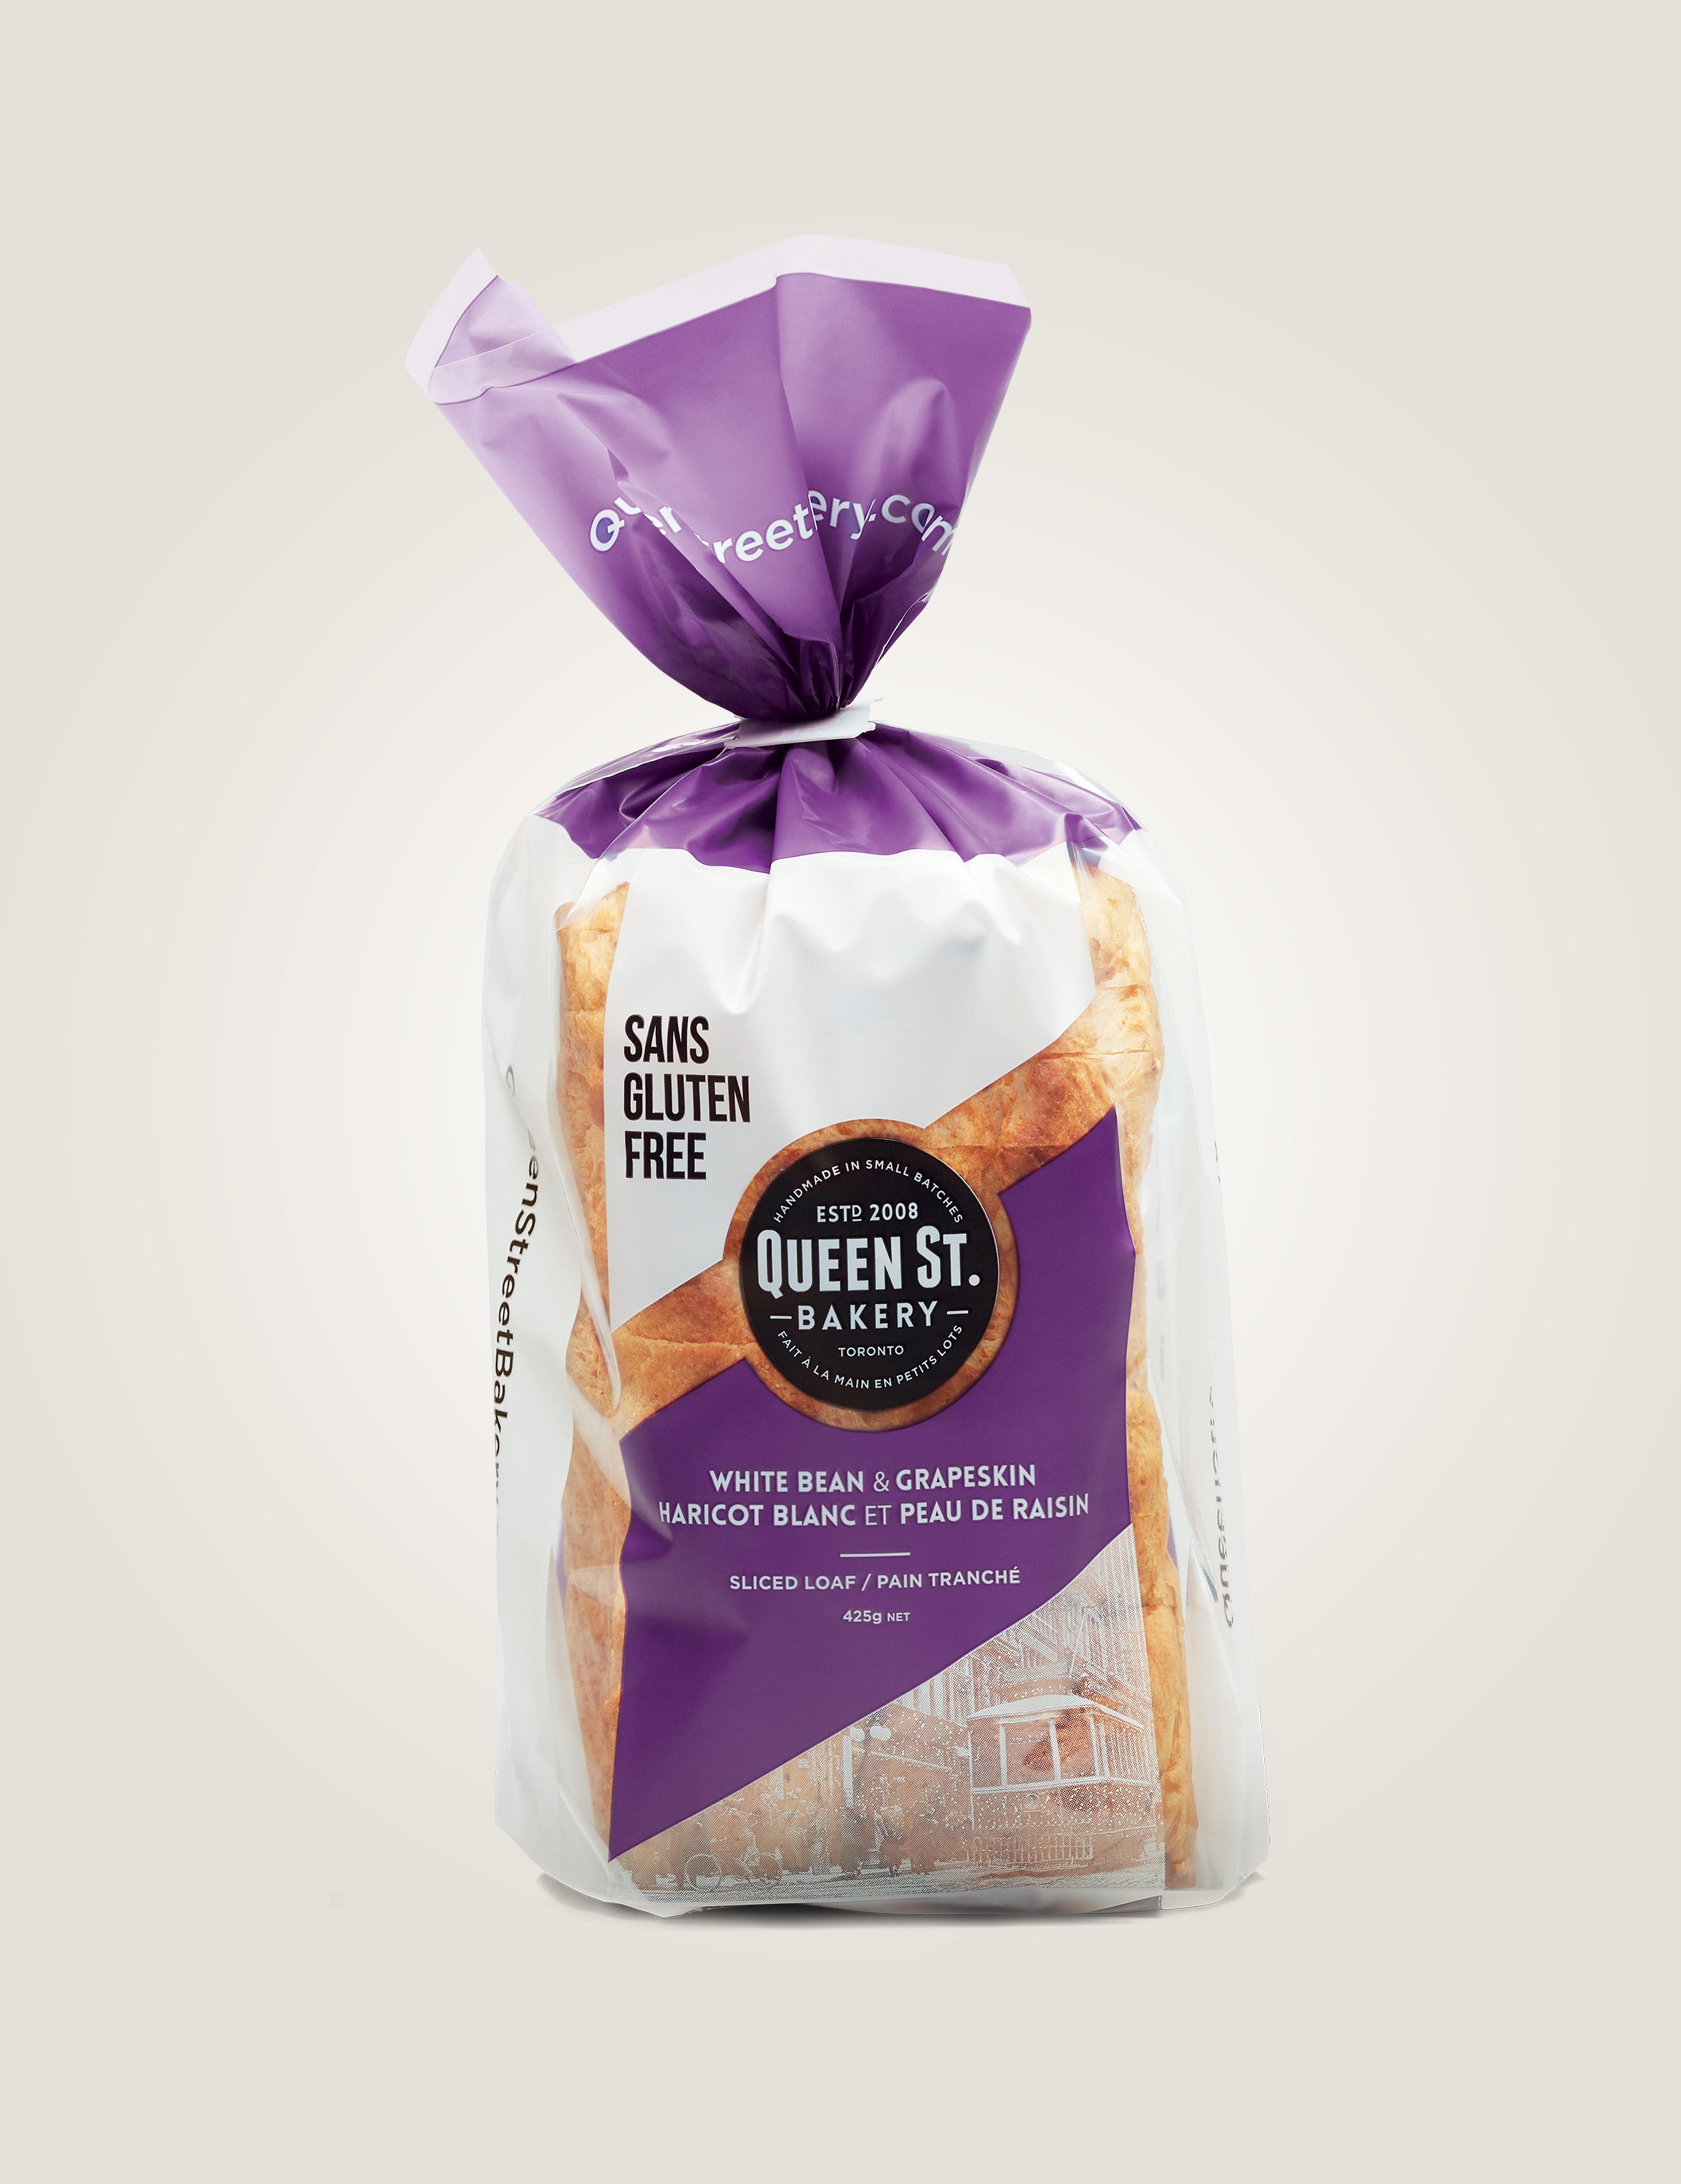 White Bean & Grapeskin Loaf (High Fiber), Frozen (minimum 50 pcs)